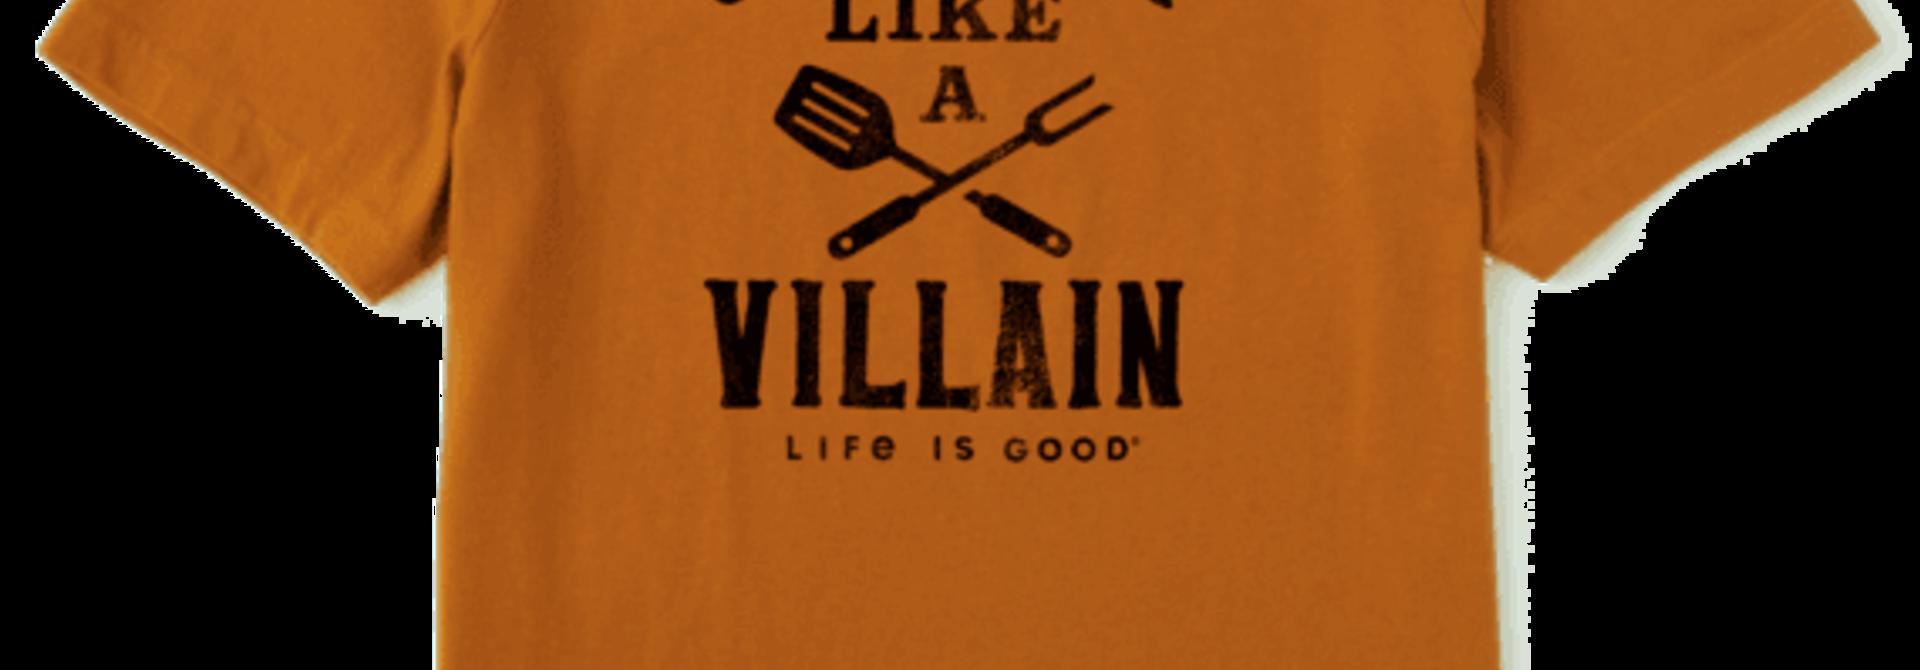 Grillin' Like A Villain T-shirt